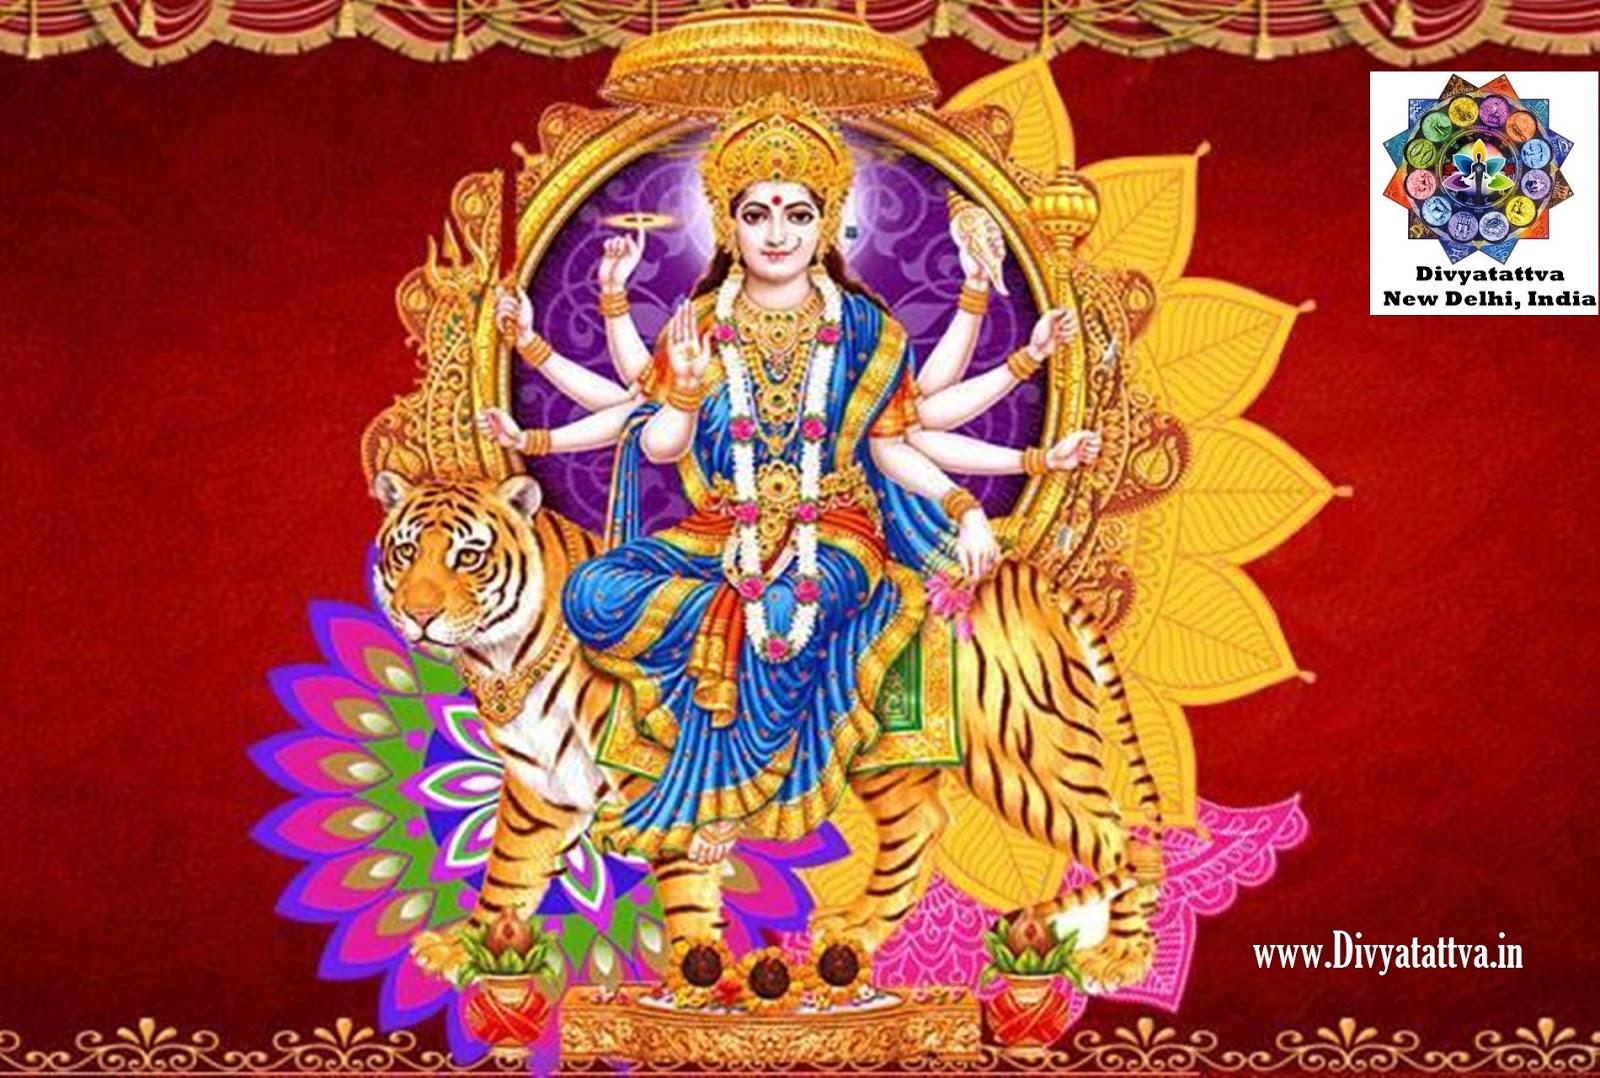 Divyatattva Astrology Free Horoscopes Psychic Tarot Yoga Tantra Occult Images Videos September 2018